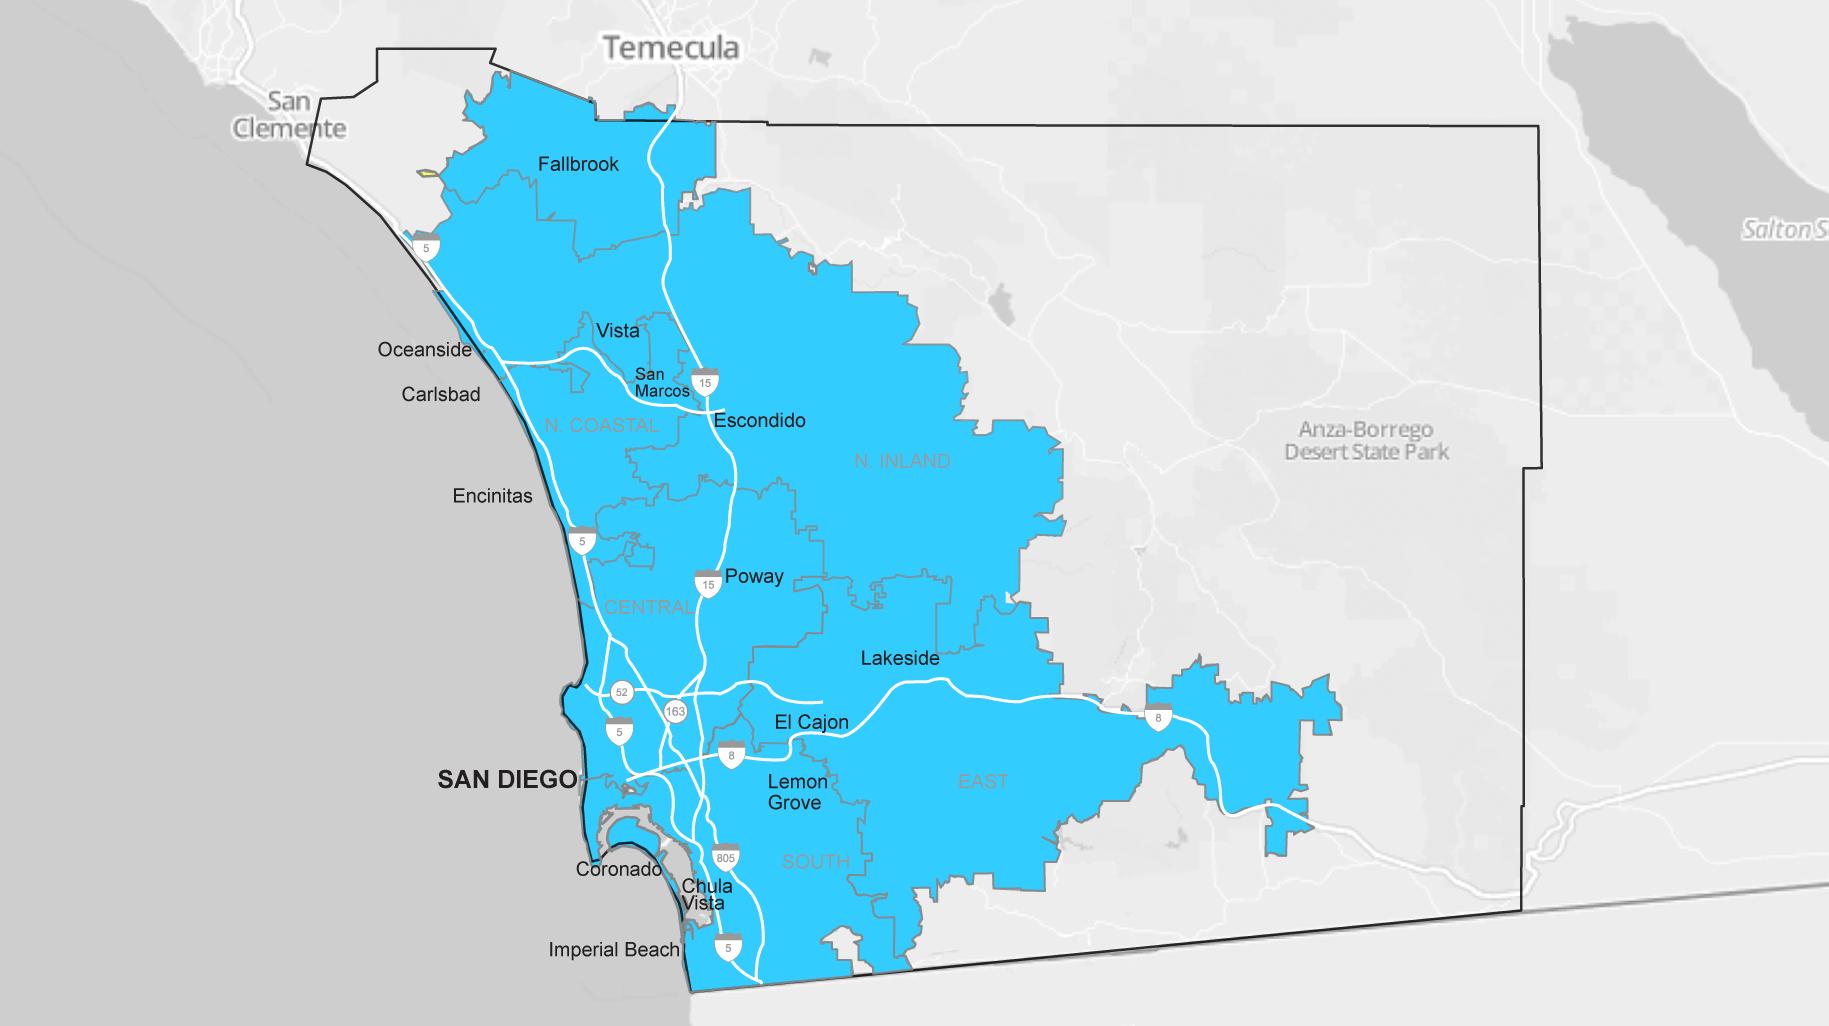 San Diego On A Map Of California - Klipy - Detailed Map Of San Diego California